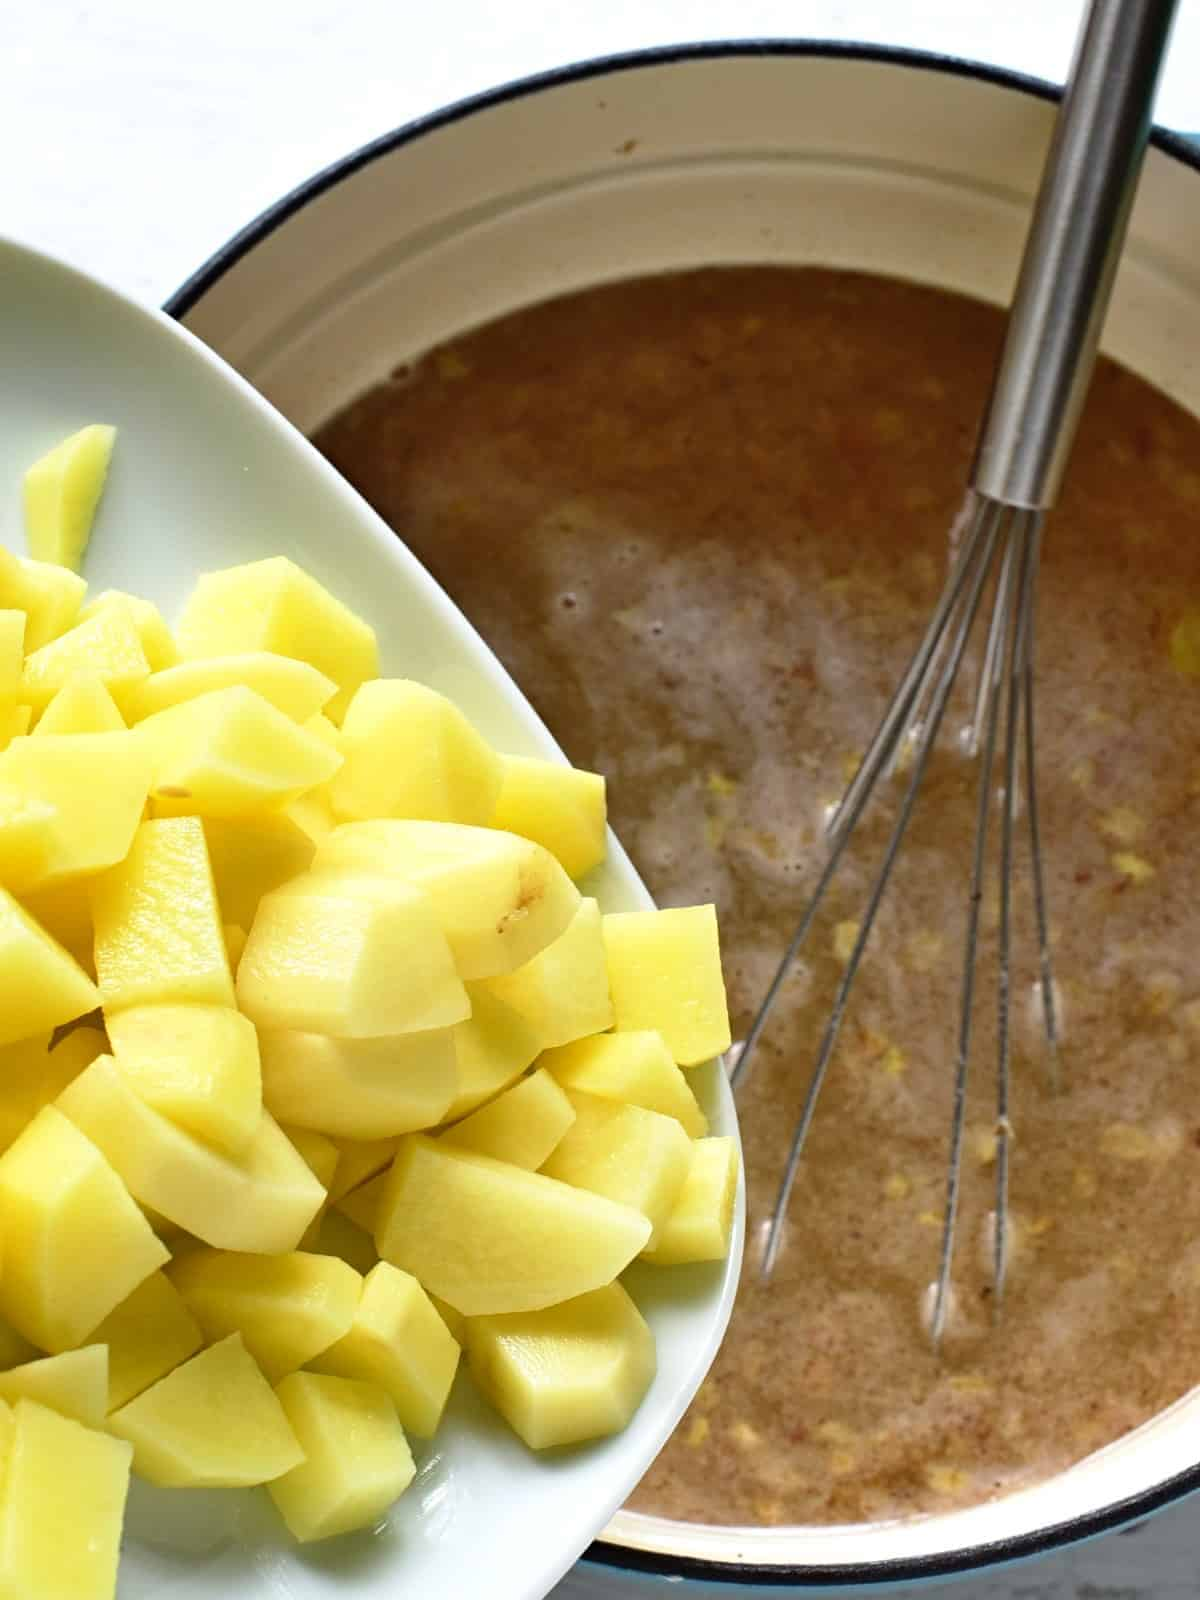 adding potatoes